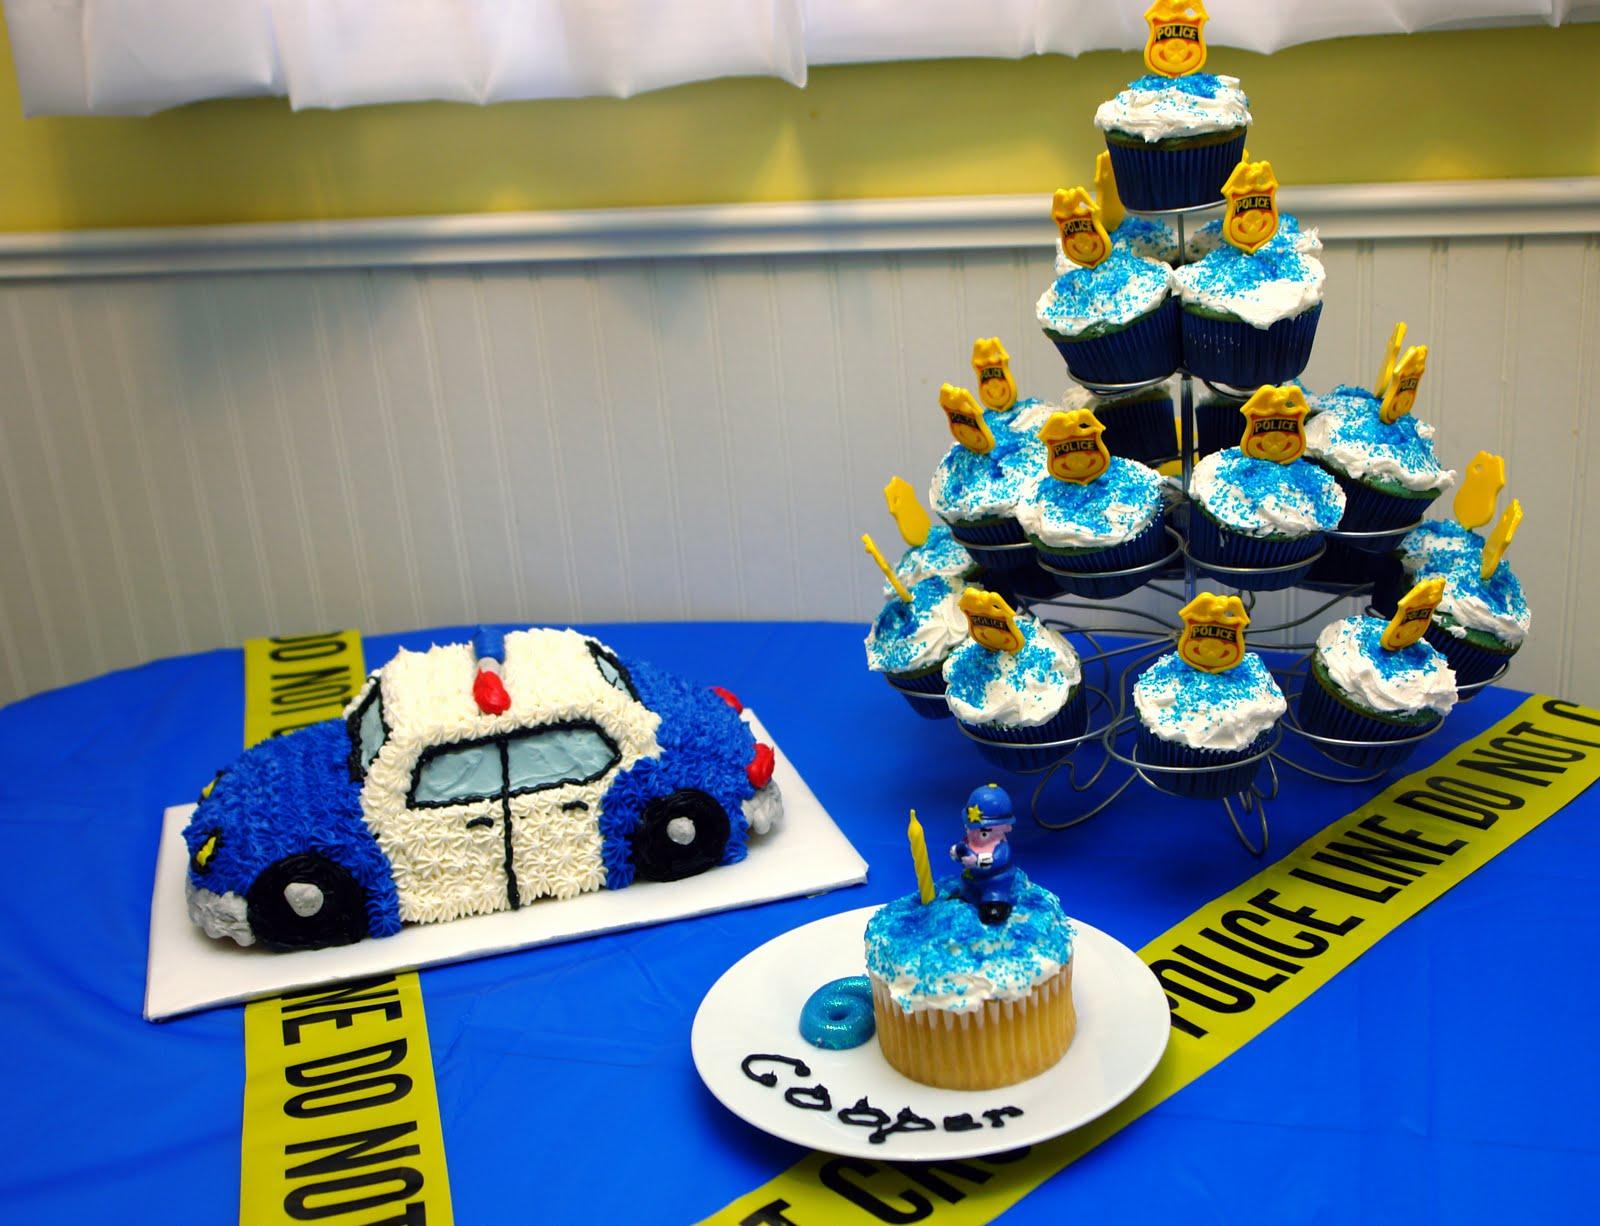 35 Lego Theme Party Table Decoration Ideas